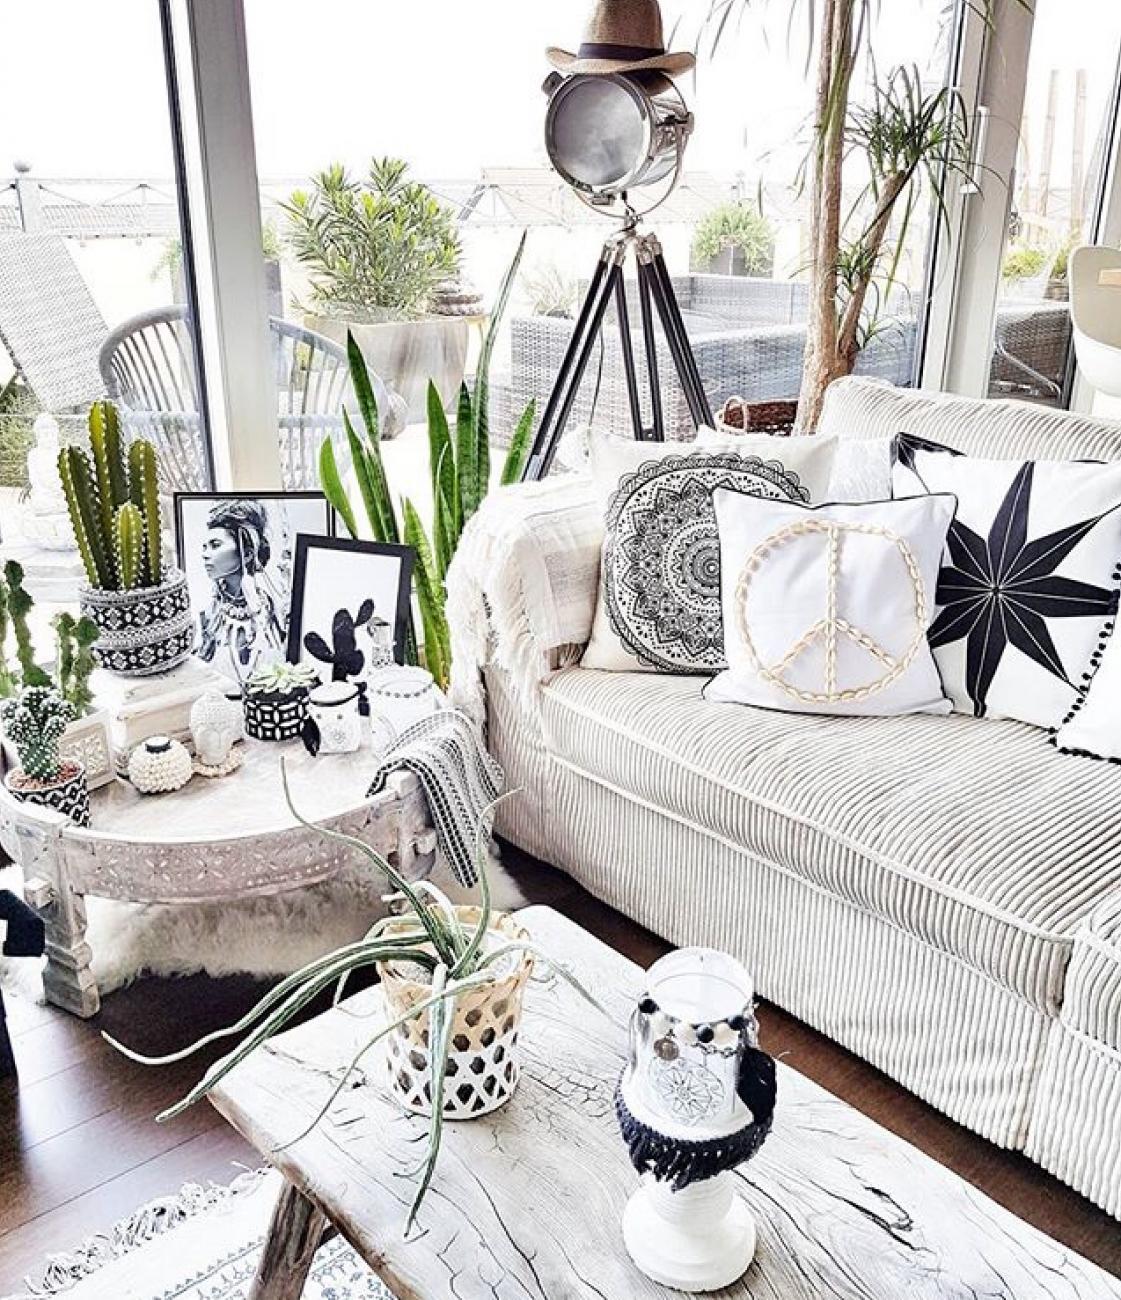 House Of Instagram Claudia Belliwood Boholiving Kate Young Design Boho Living Room Scandi Living Room Home Accessories #scandi #boho #living #room